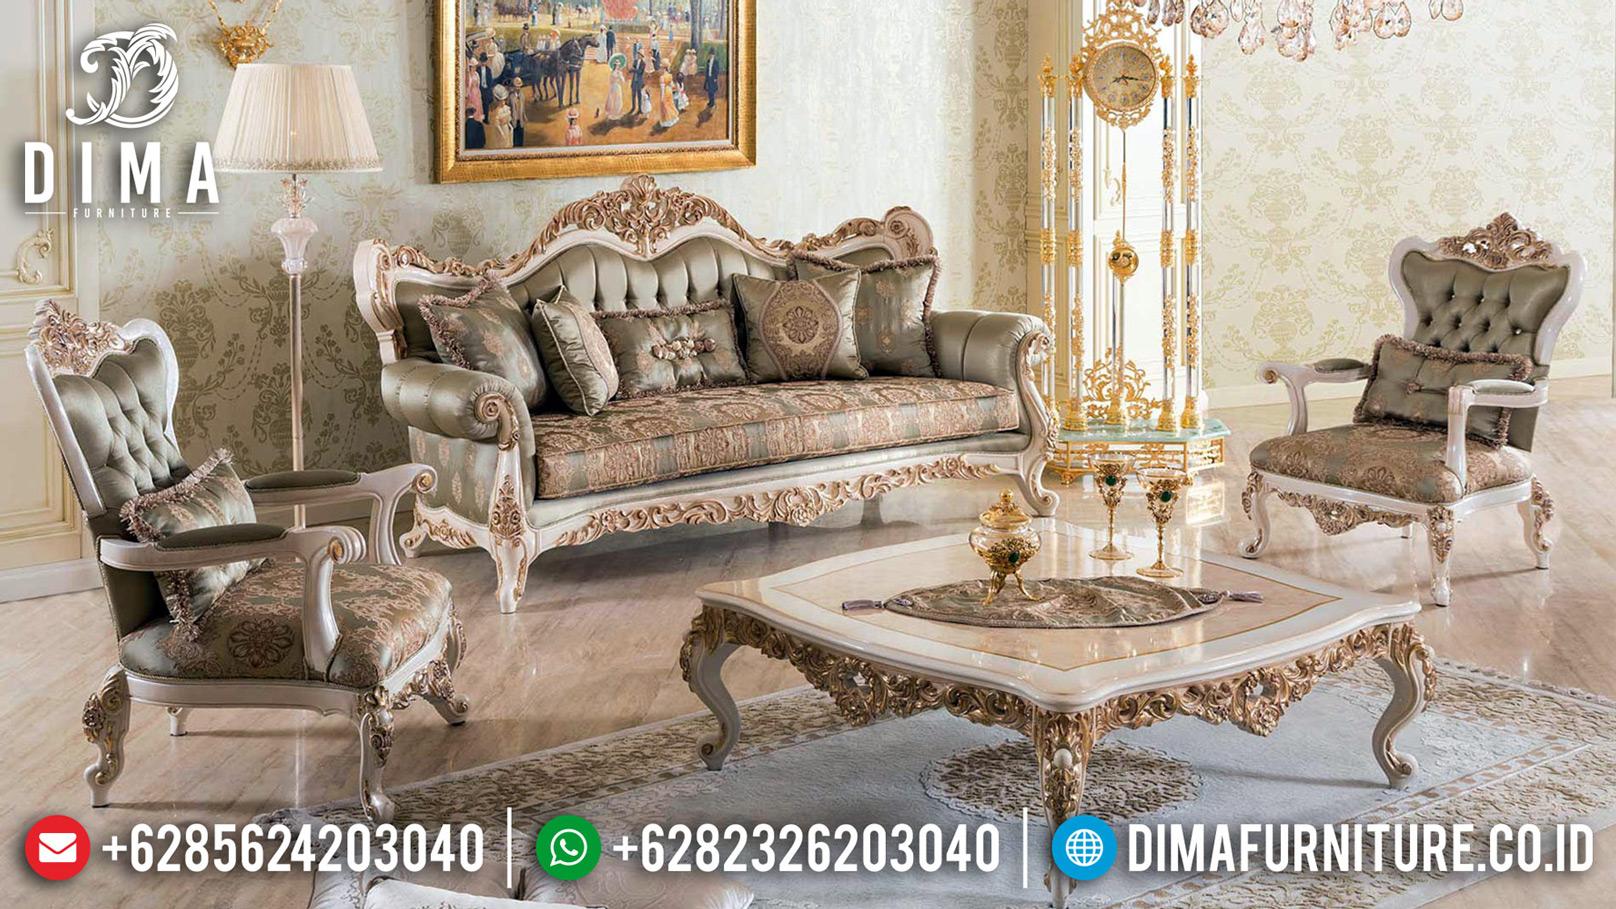 New Sofa Tamu Mewah Ukiran Jepara Luxurian Type Guaranteed Product MMJ-0643